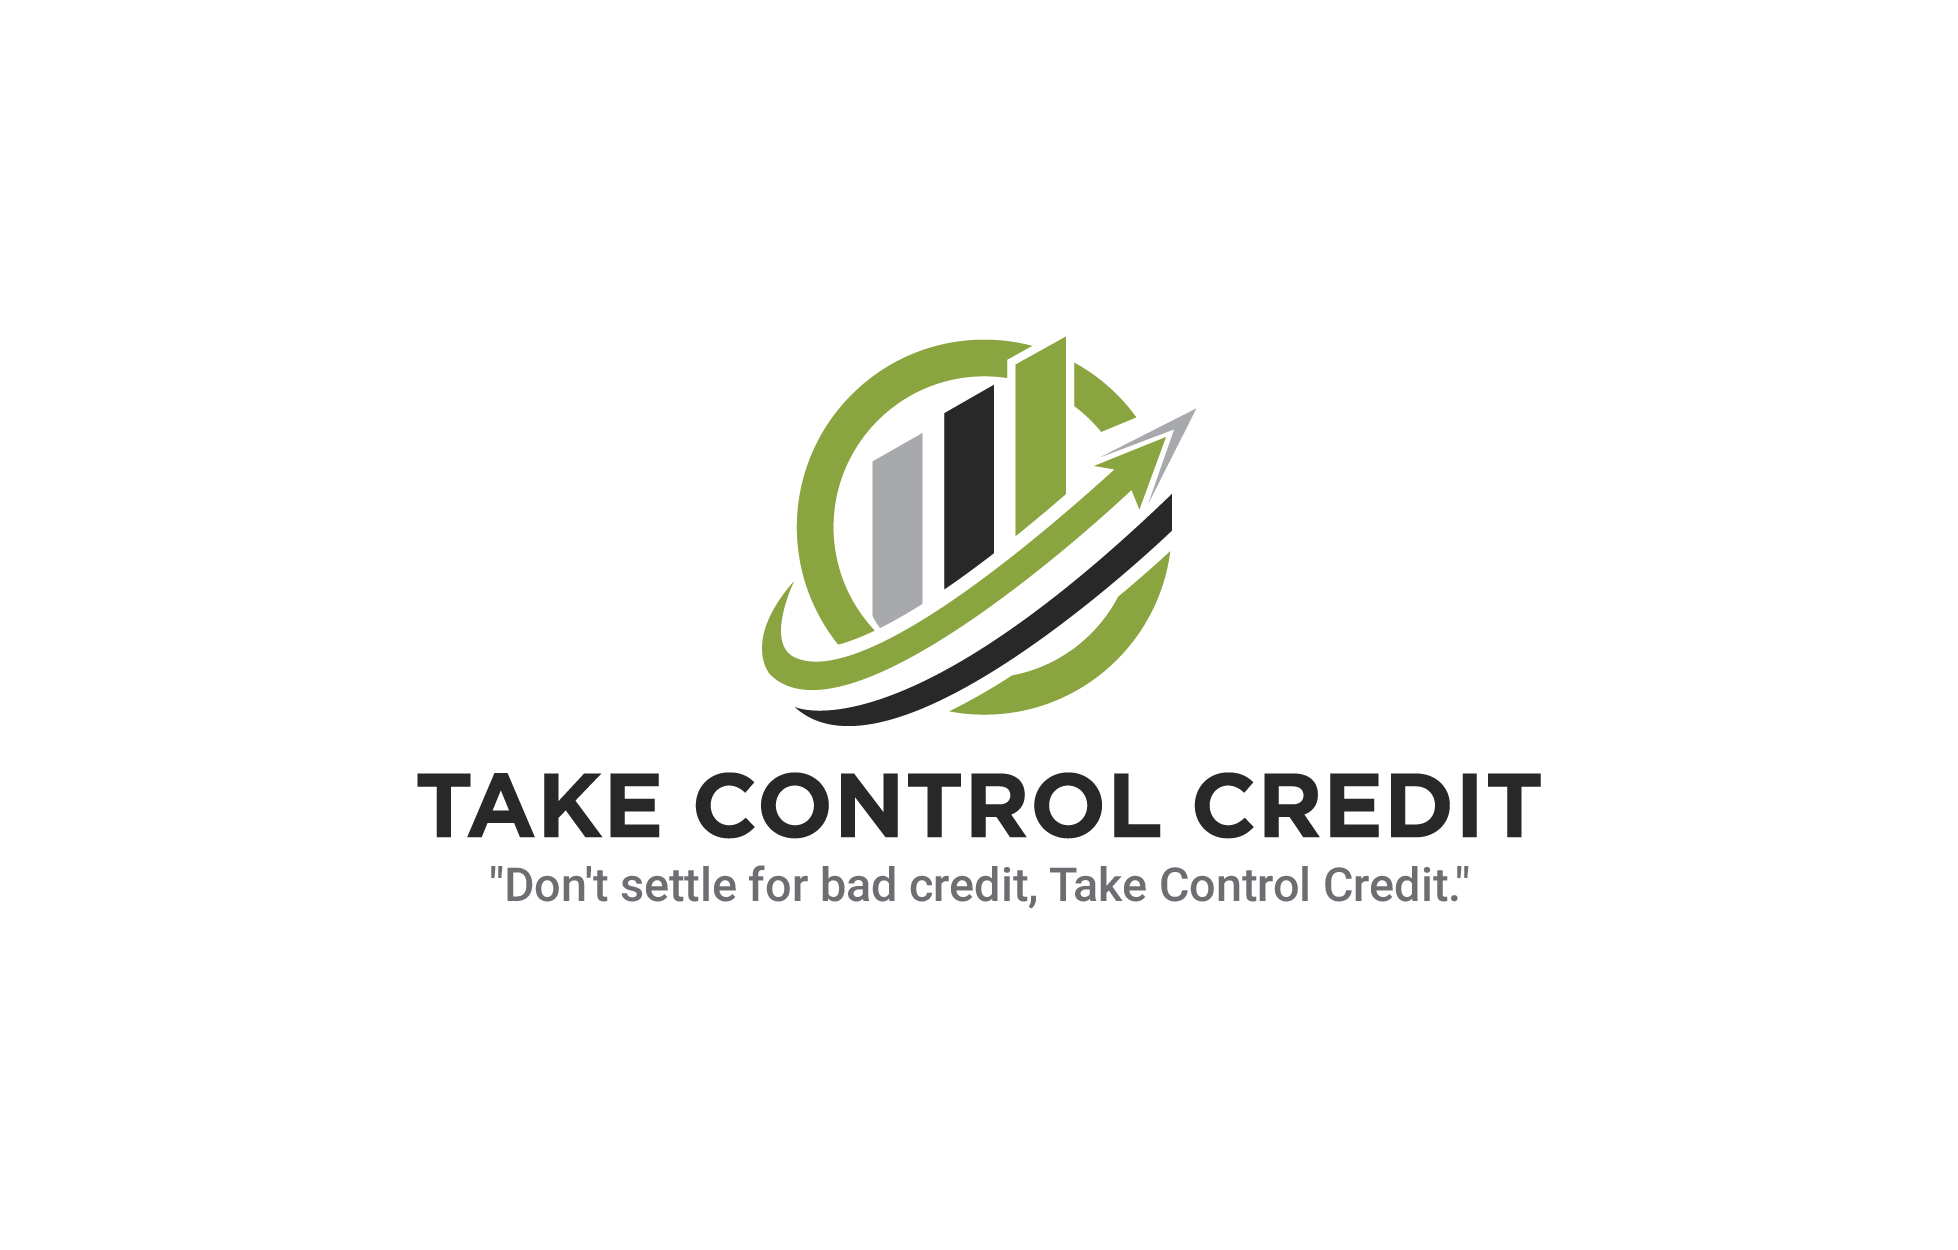 Take Control Credit